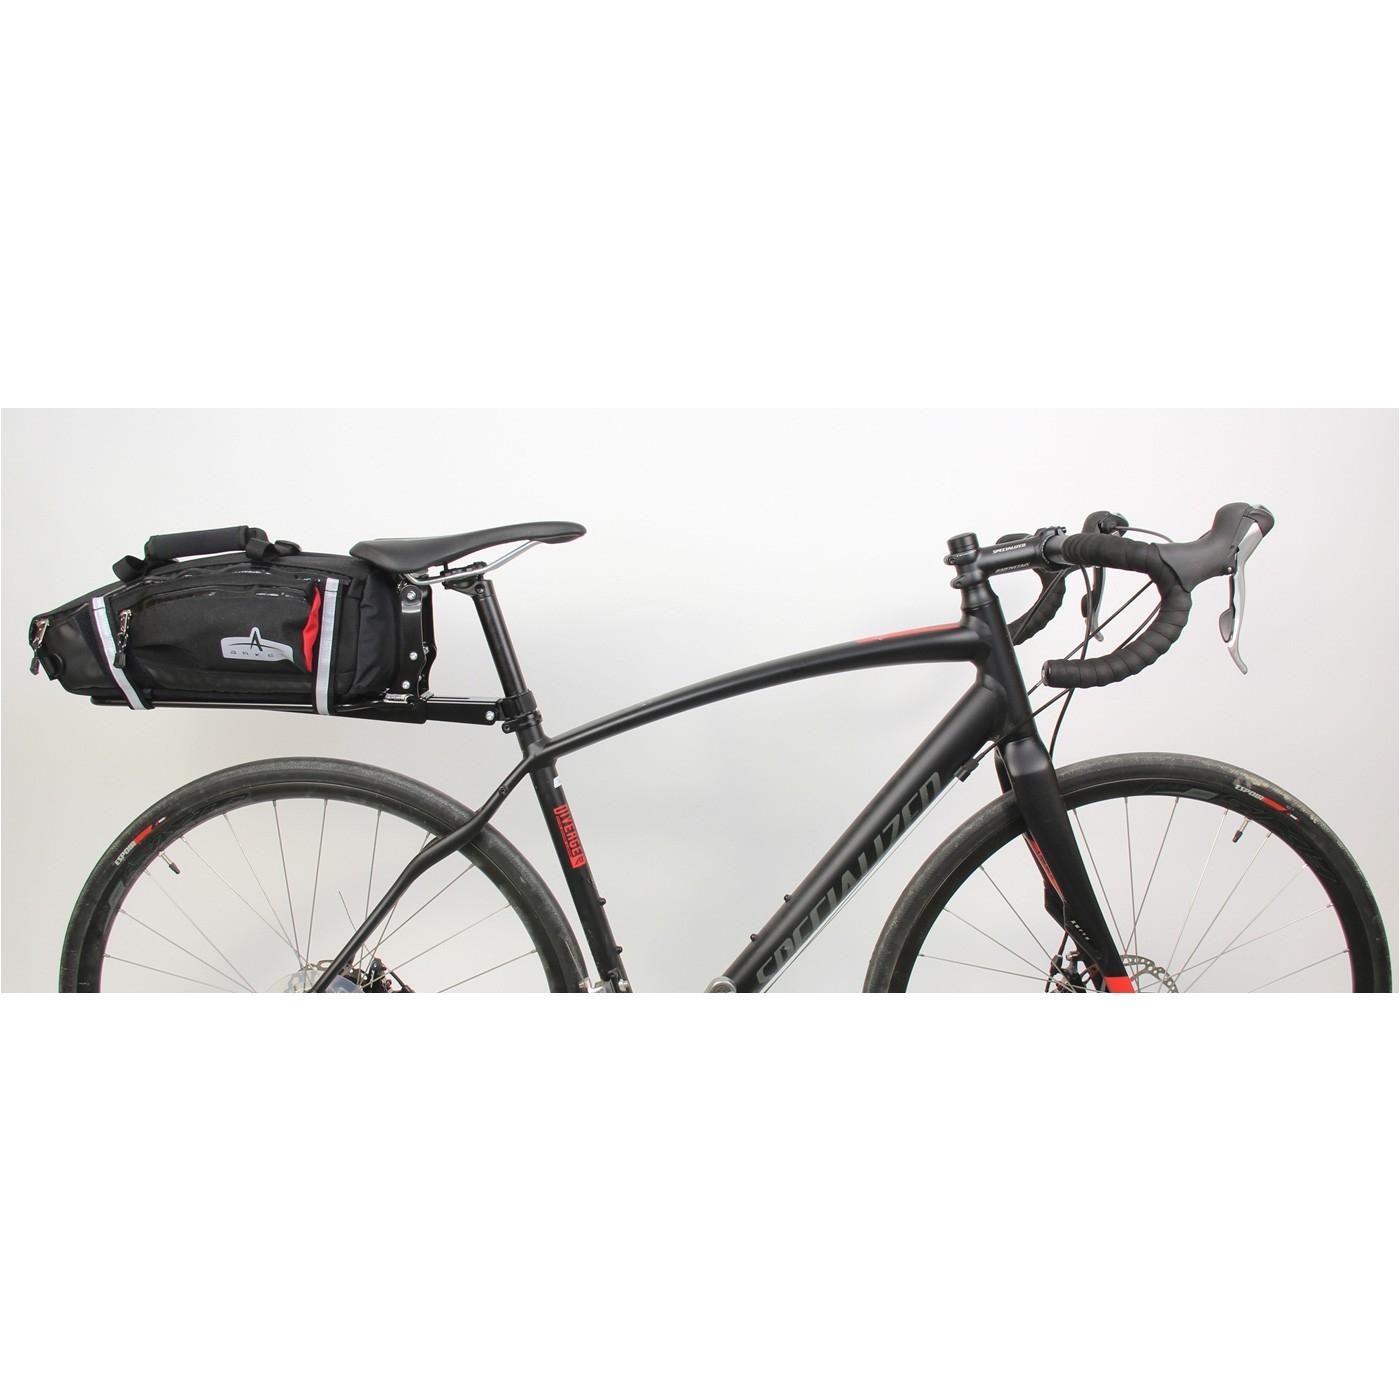 Bike Bags for Rear Rack Arkel Randonneur Rack Seat Post Rack Carbon Seat Post Friendly